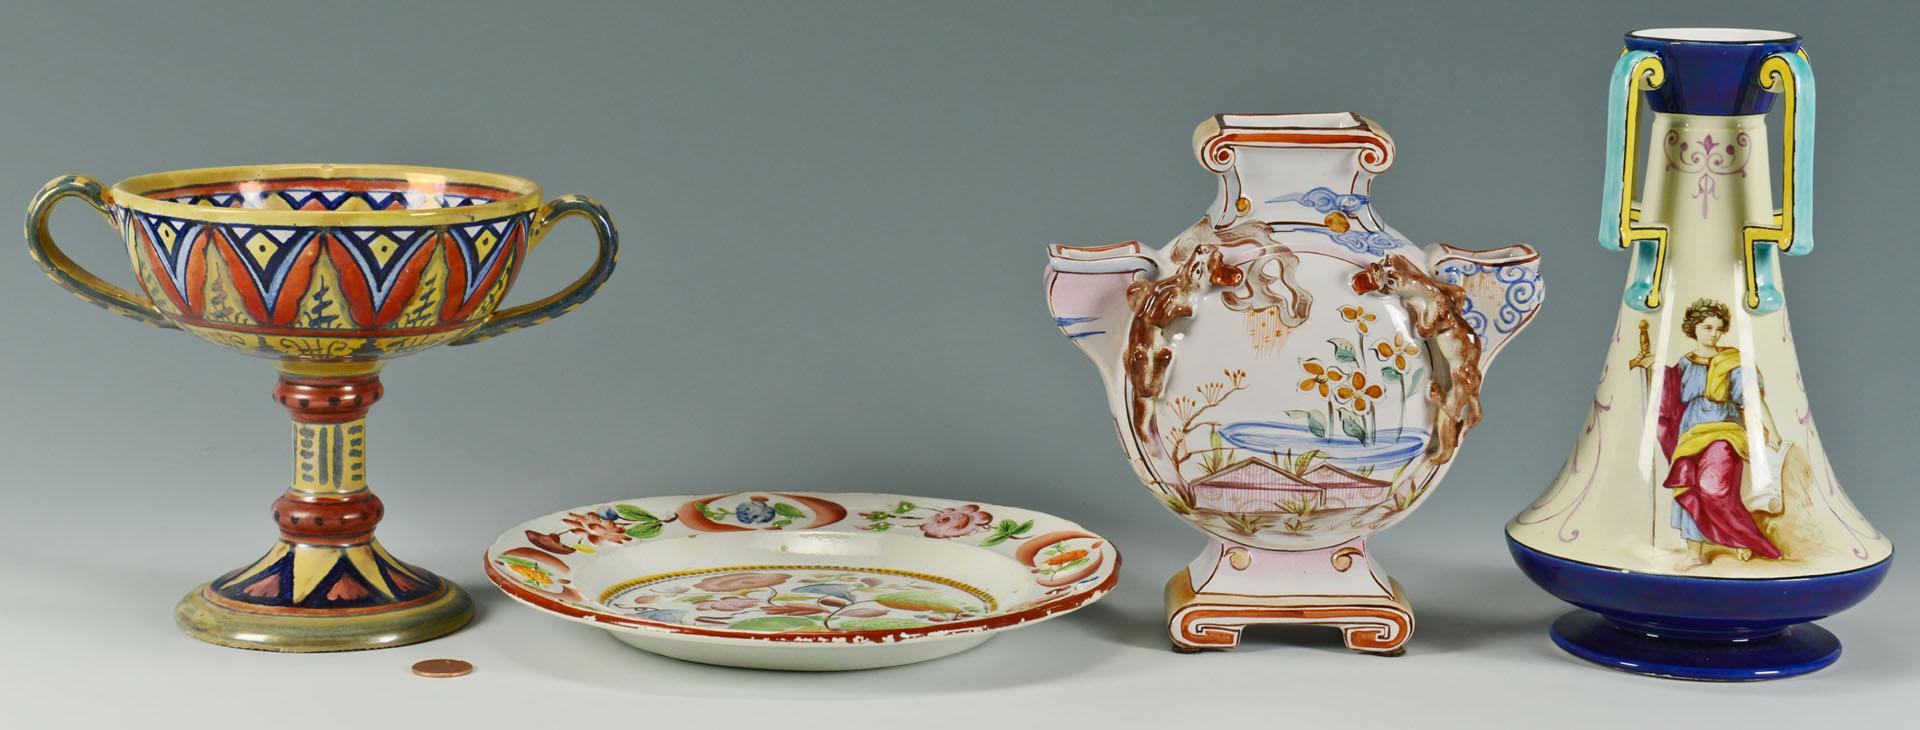 Lot 632: 3 Italian Vases & Prattware Plate, 4 pcs.